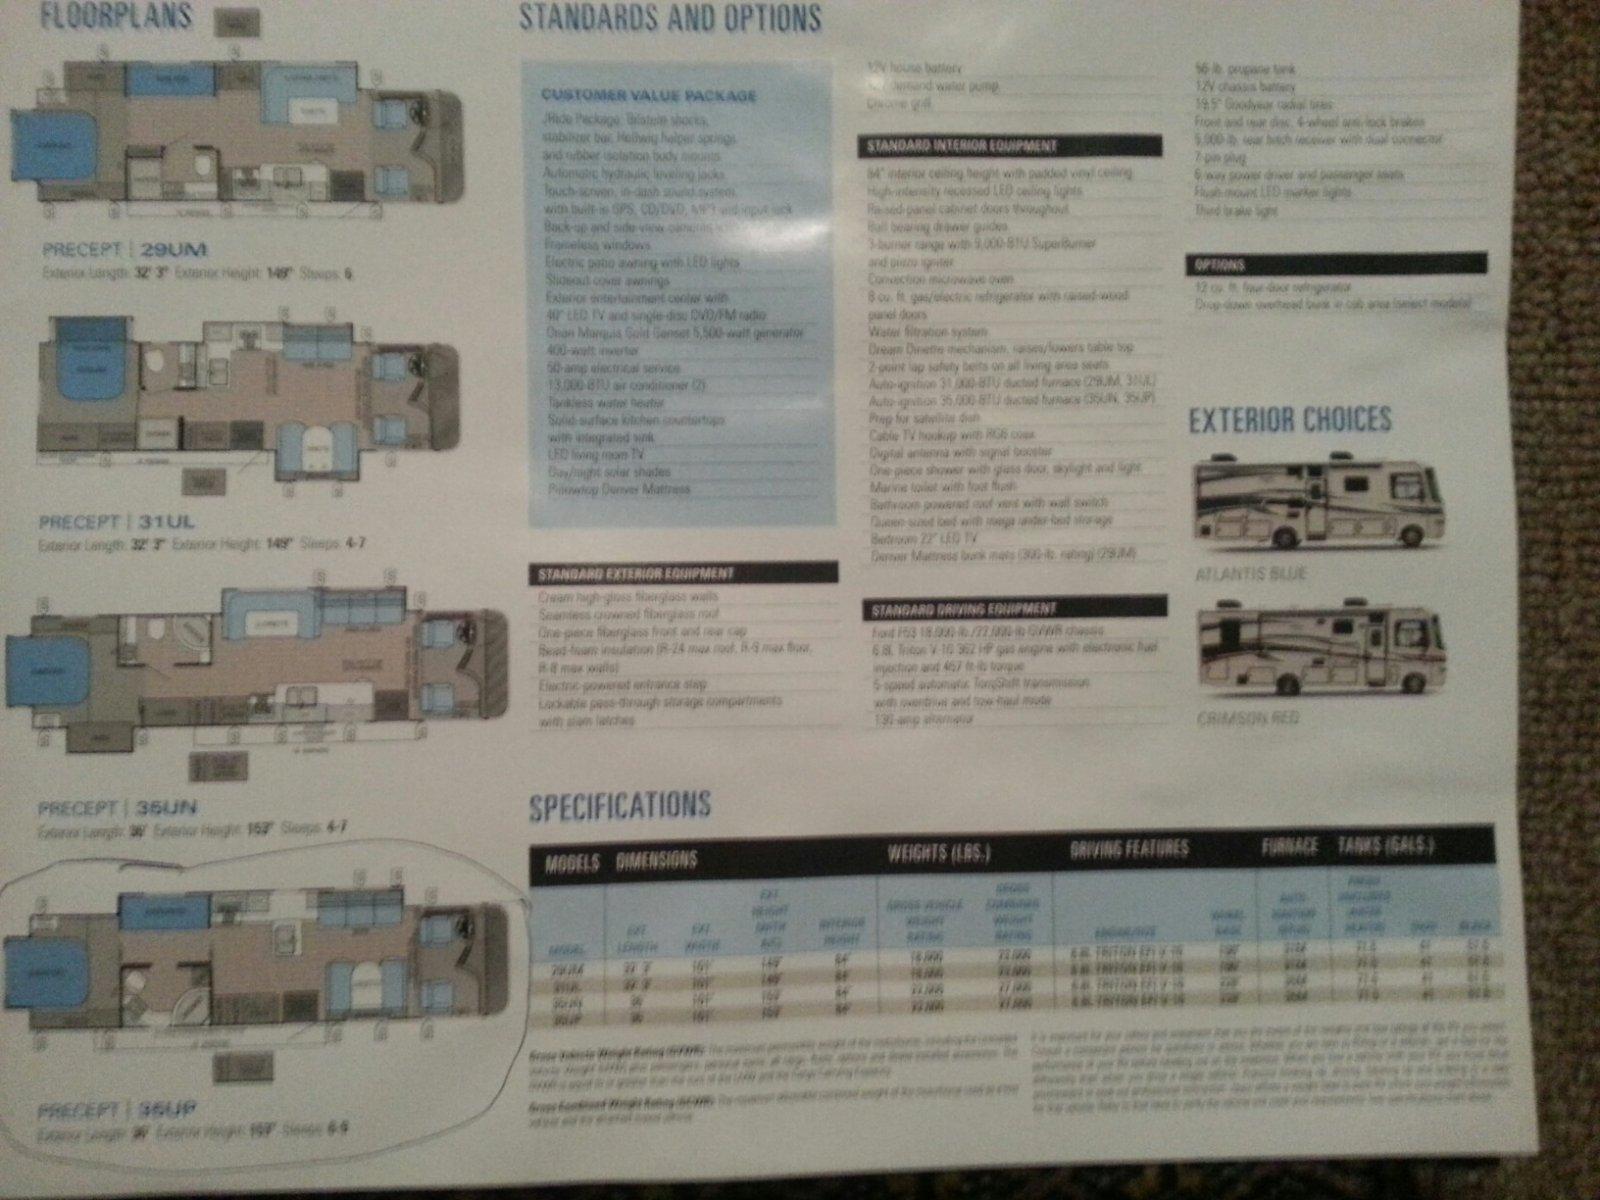 Click image for larger version  Name:Precept - Brochure - Floor Plans.jpg Views:137 Size:237.3 KB ID:74369